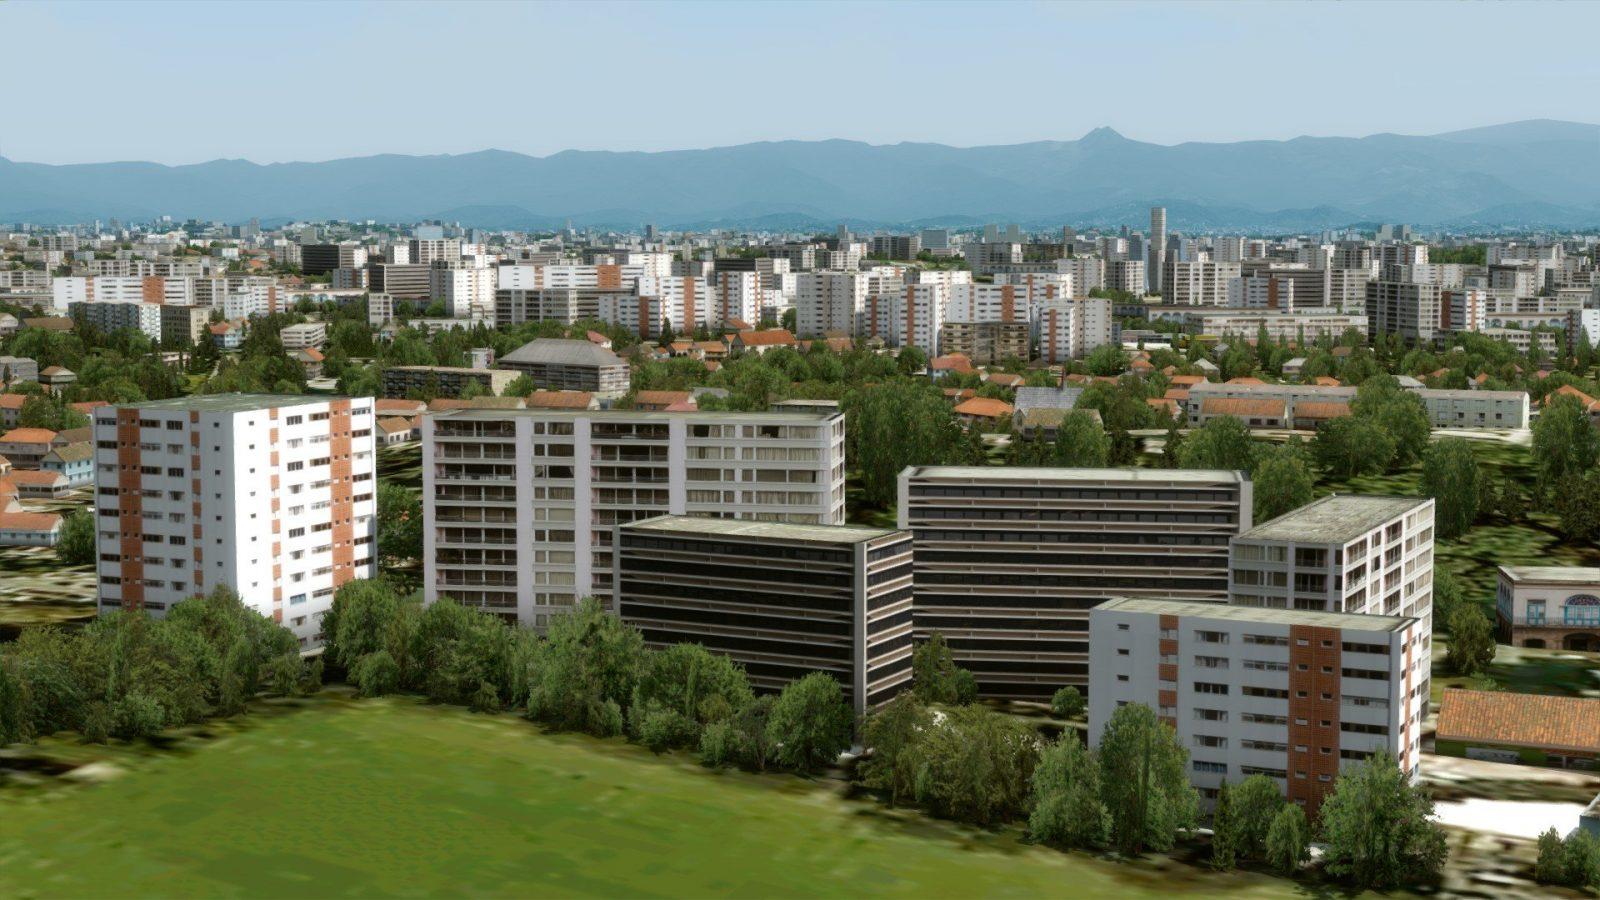 orbx-buildings-hd-previews-15-1600x900.j